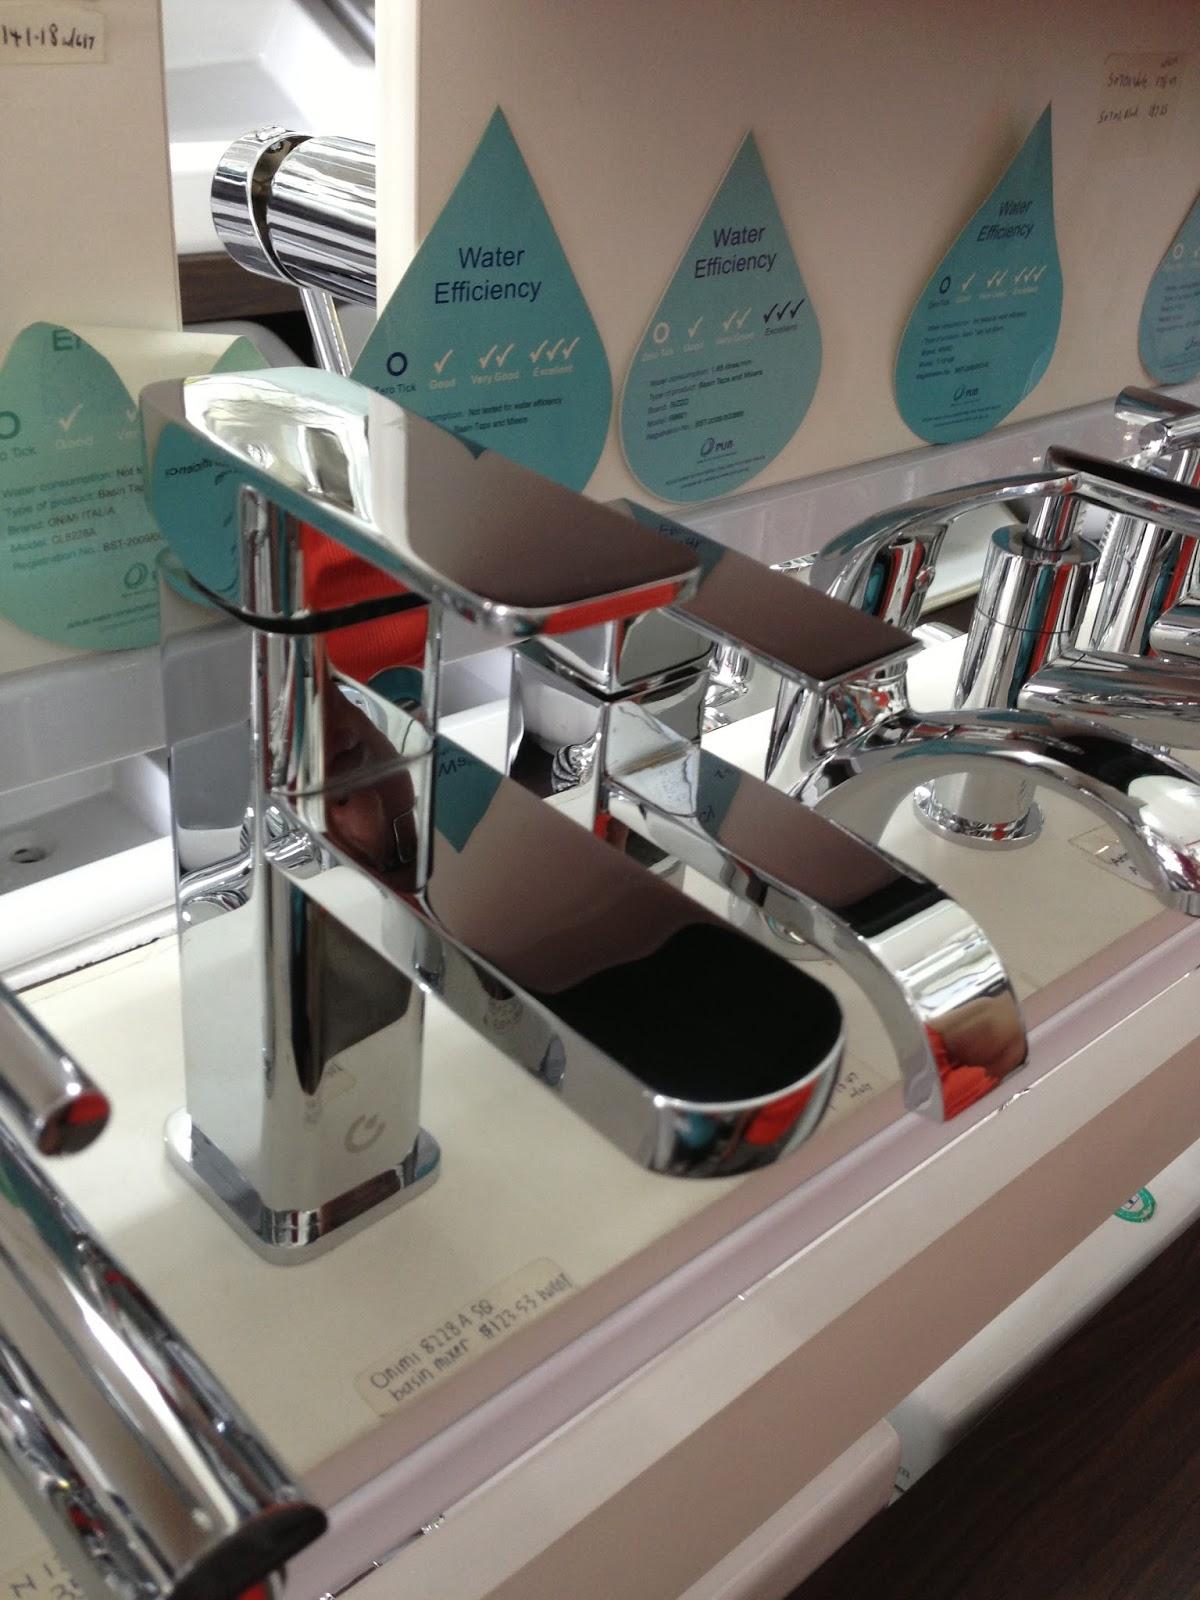 Bathroom Accessories Jalan Besar reno journey - kitchen sink & tap, washroom accessories | yunzhijian